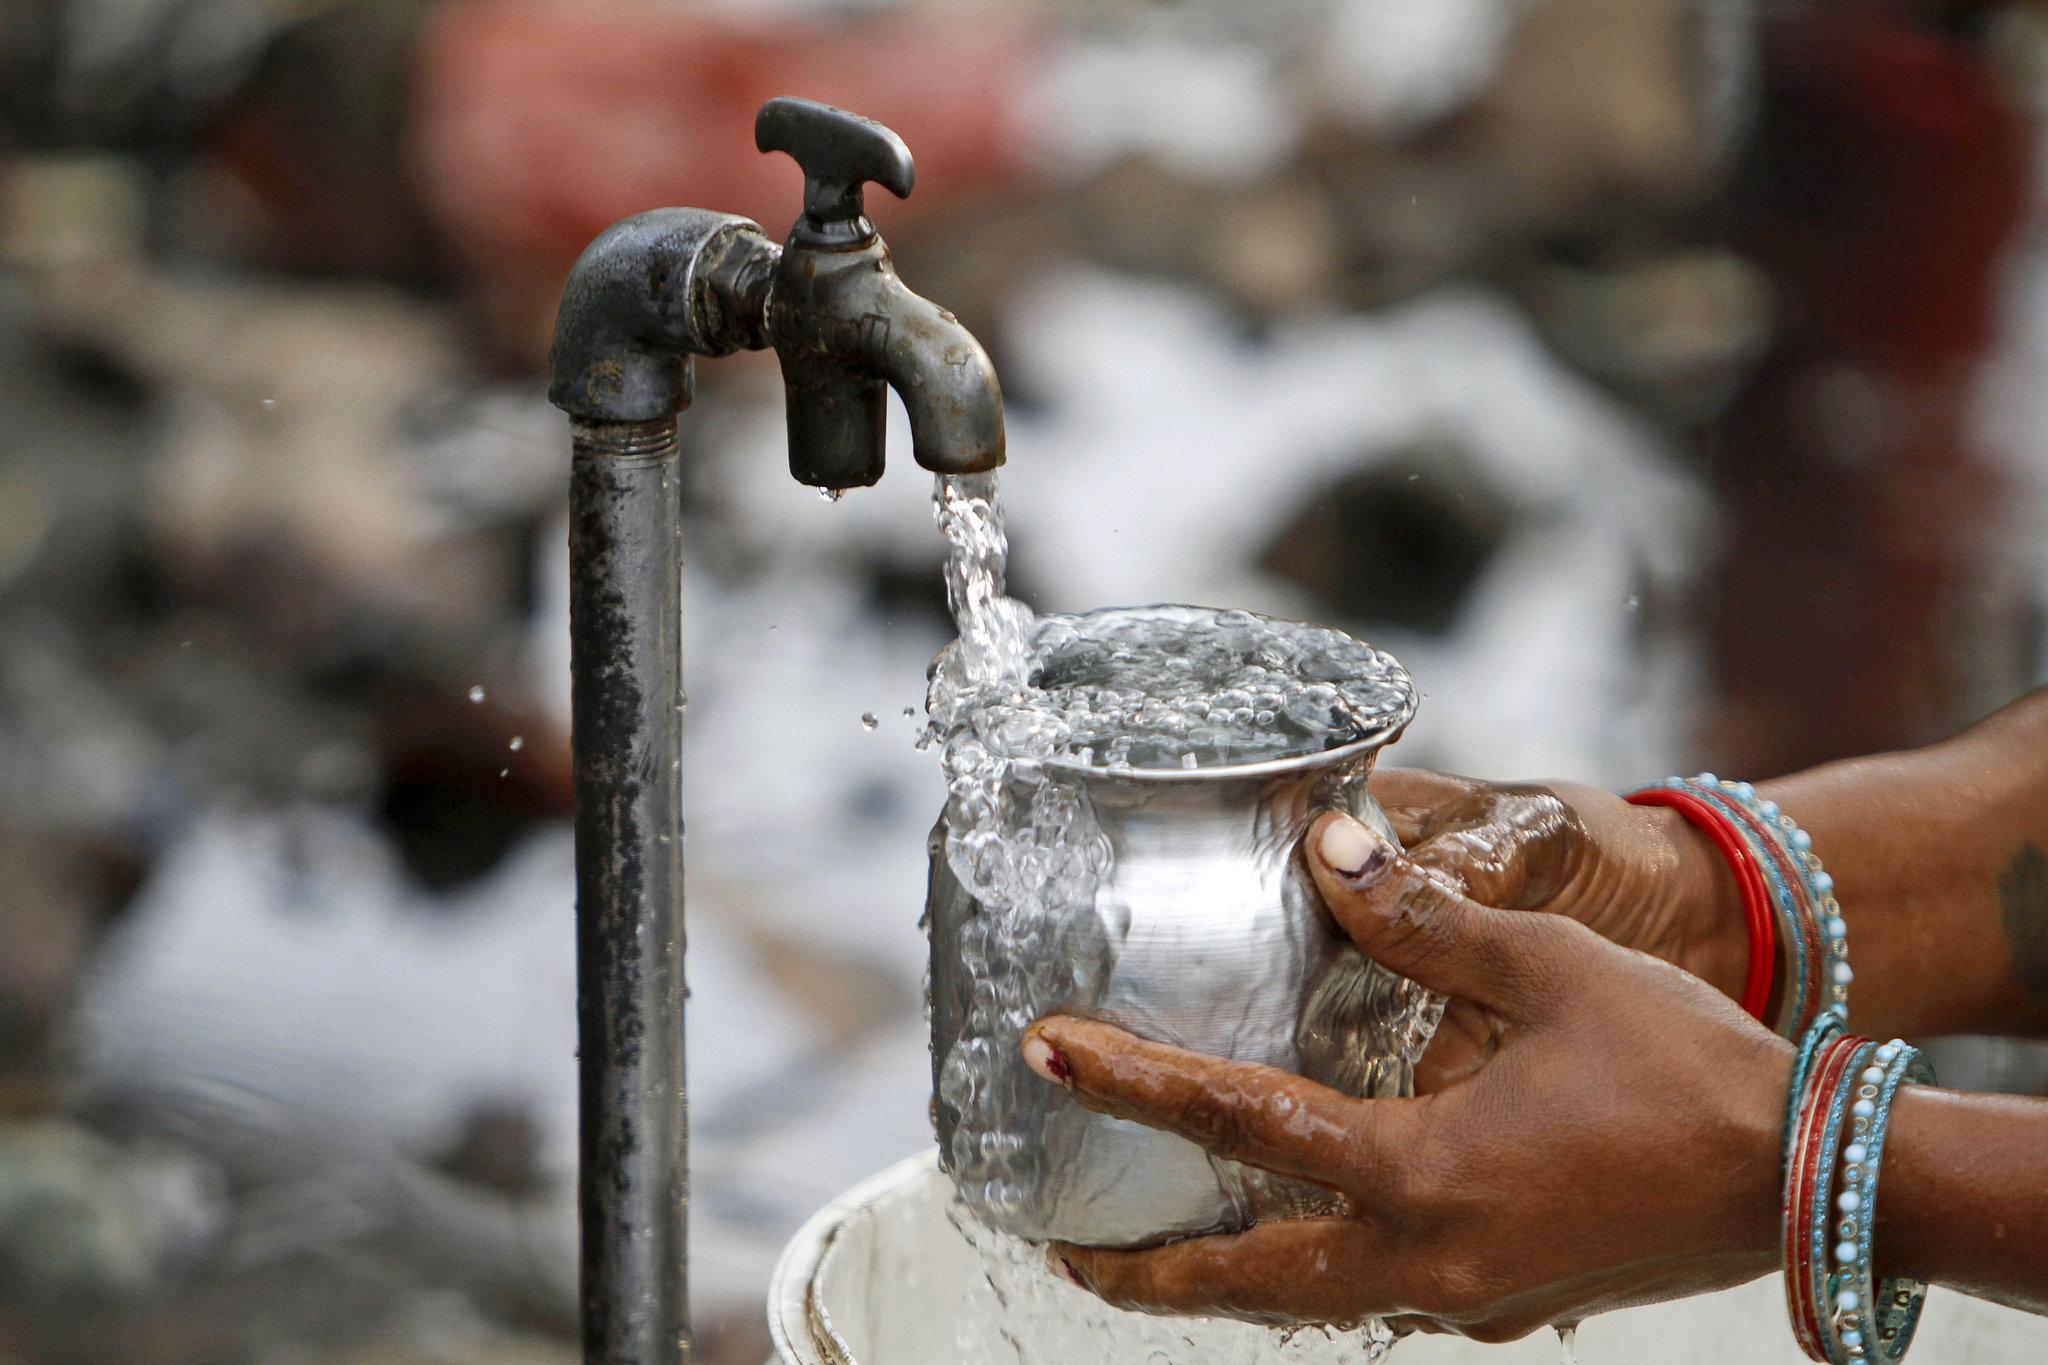 'Neel Nirmal Pariyojana' to provide safe drinking water in Bihar by March 2020